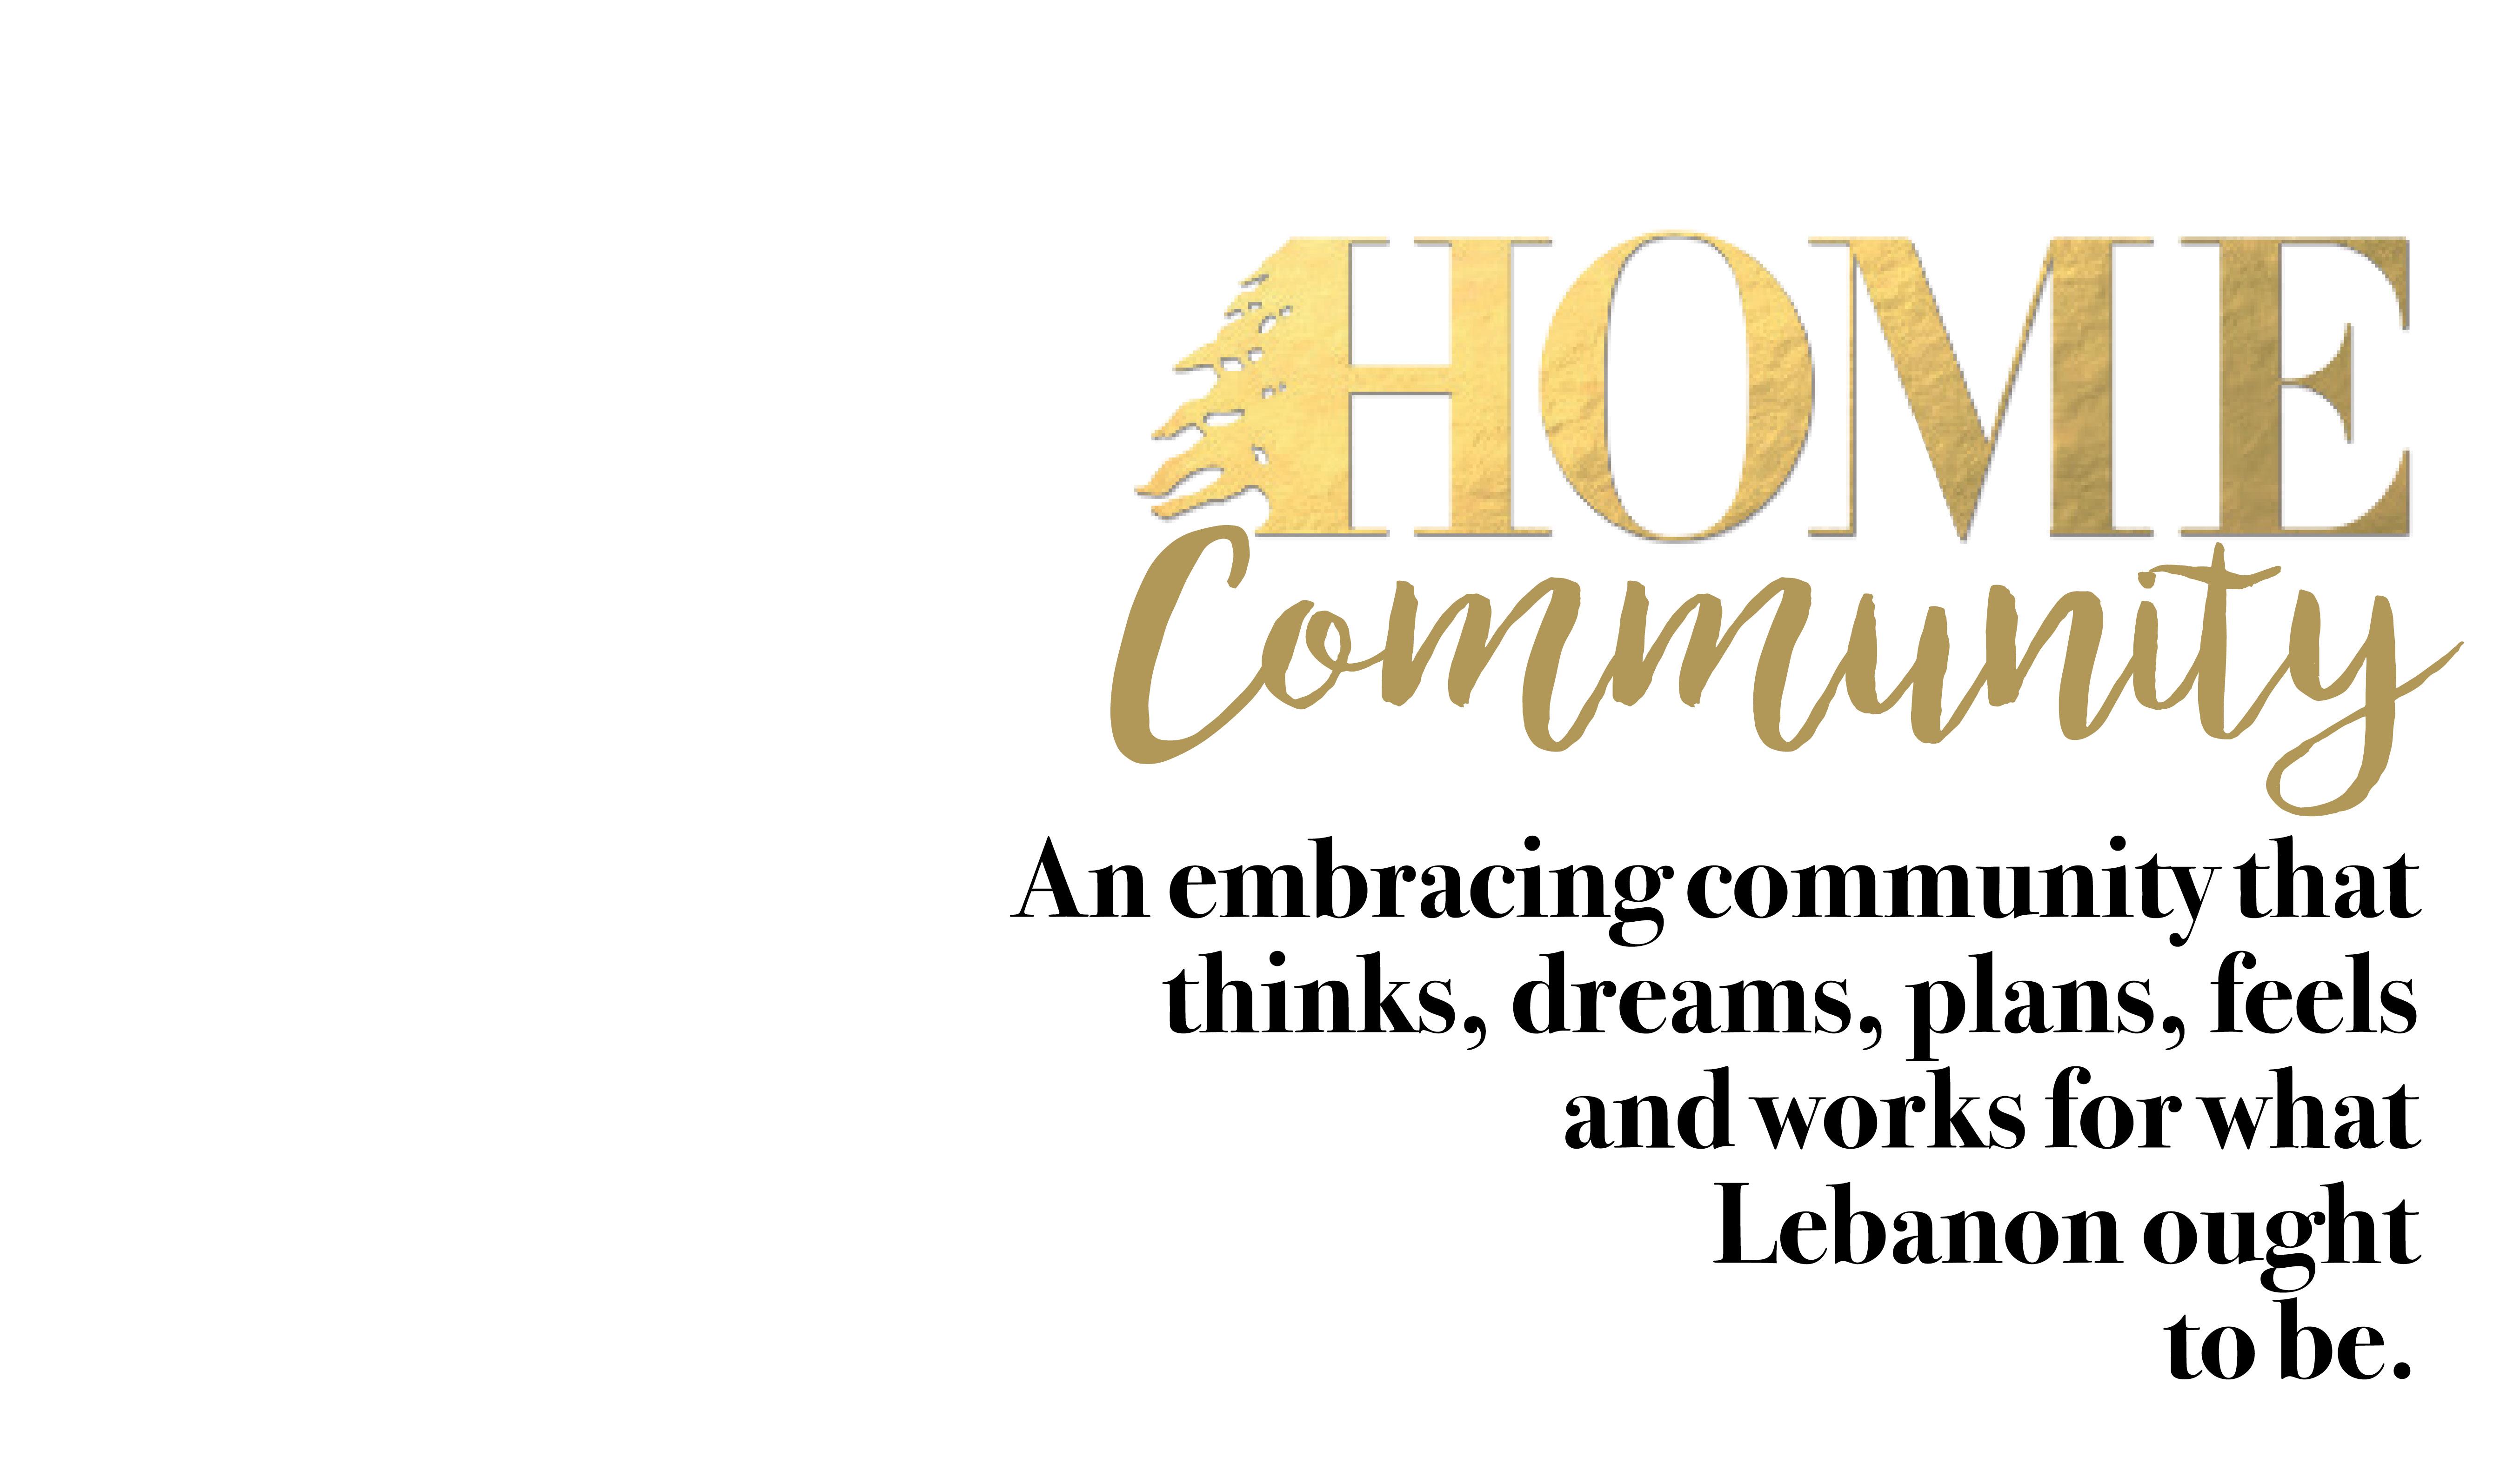 Human Chain Lebanon - #weareone